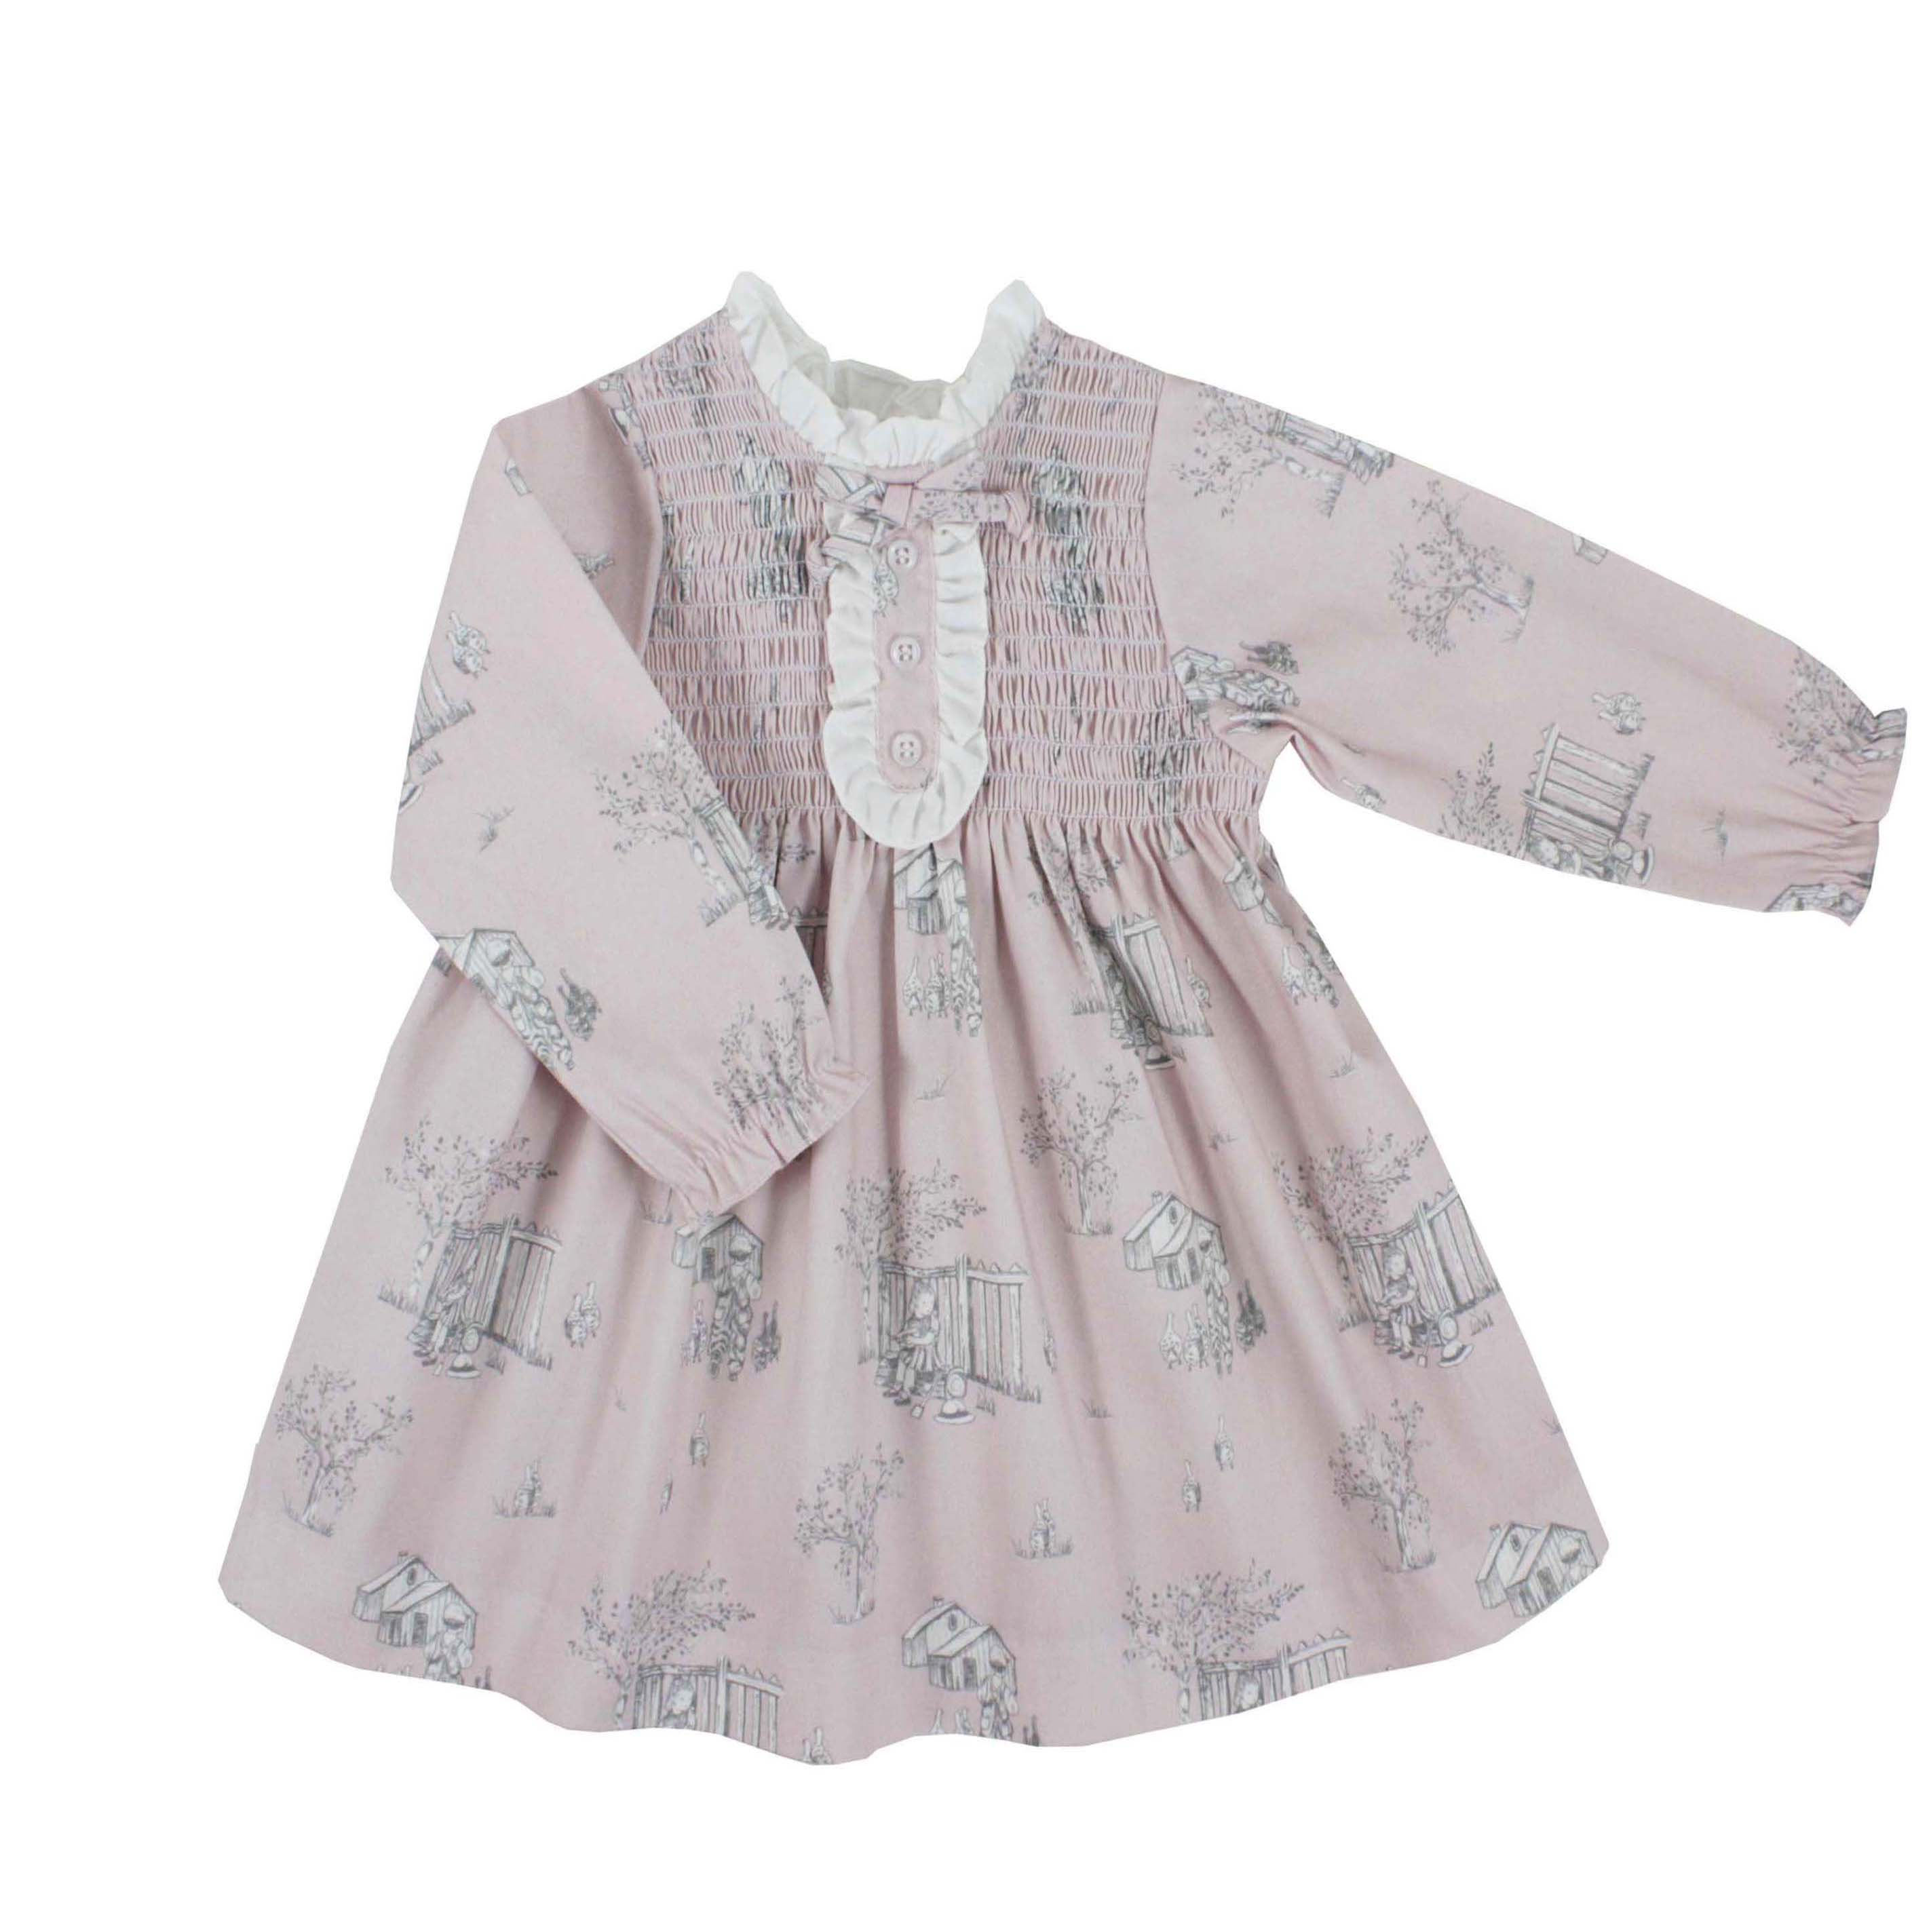 d92886669a17 Toddler girl dress long sleeve pink toile pattern. Irene model